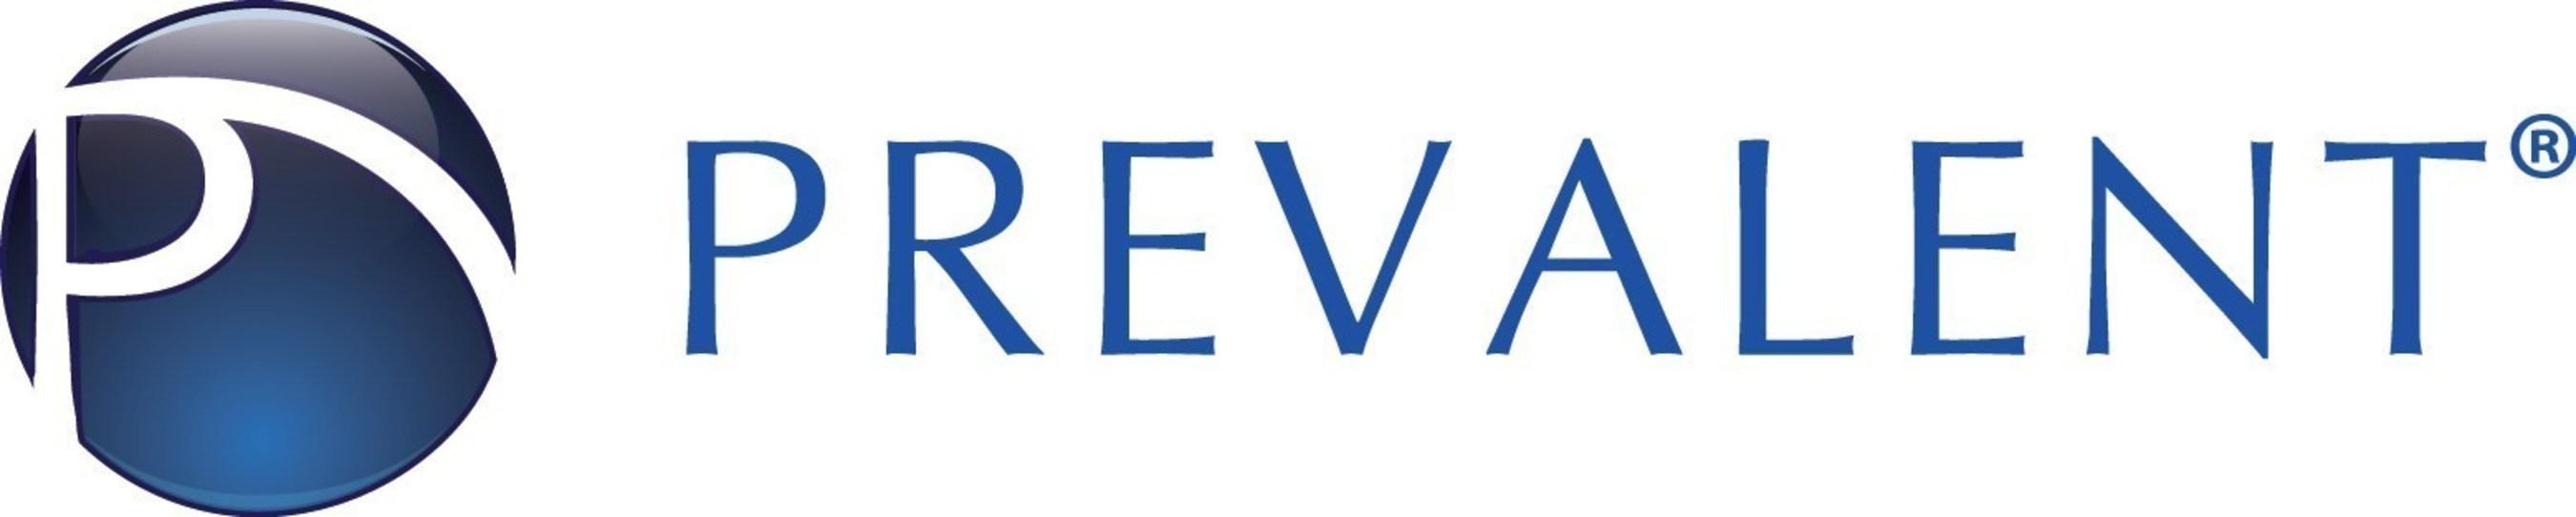 Prevalent logo